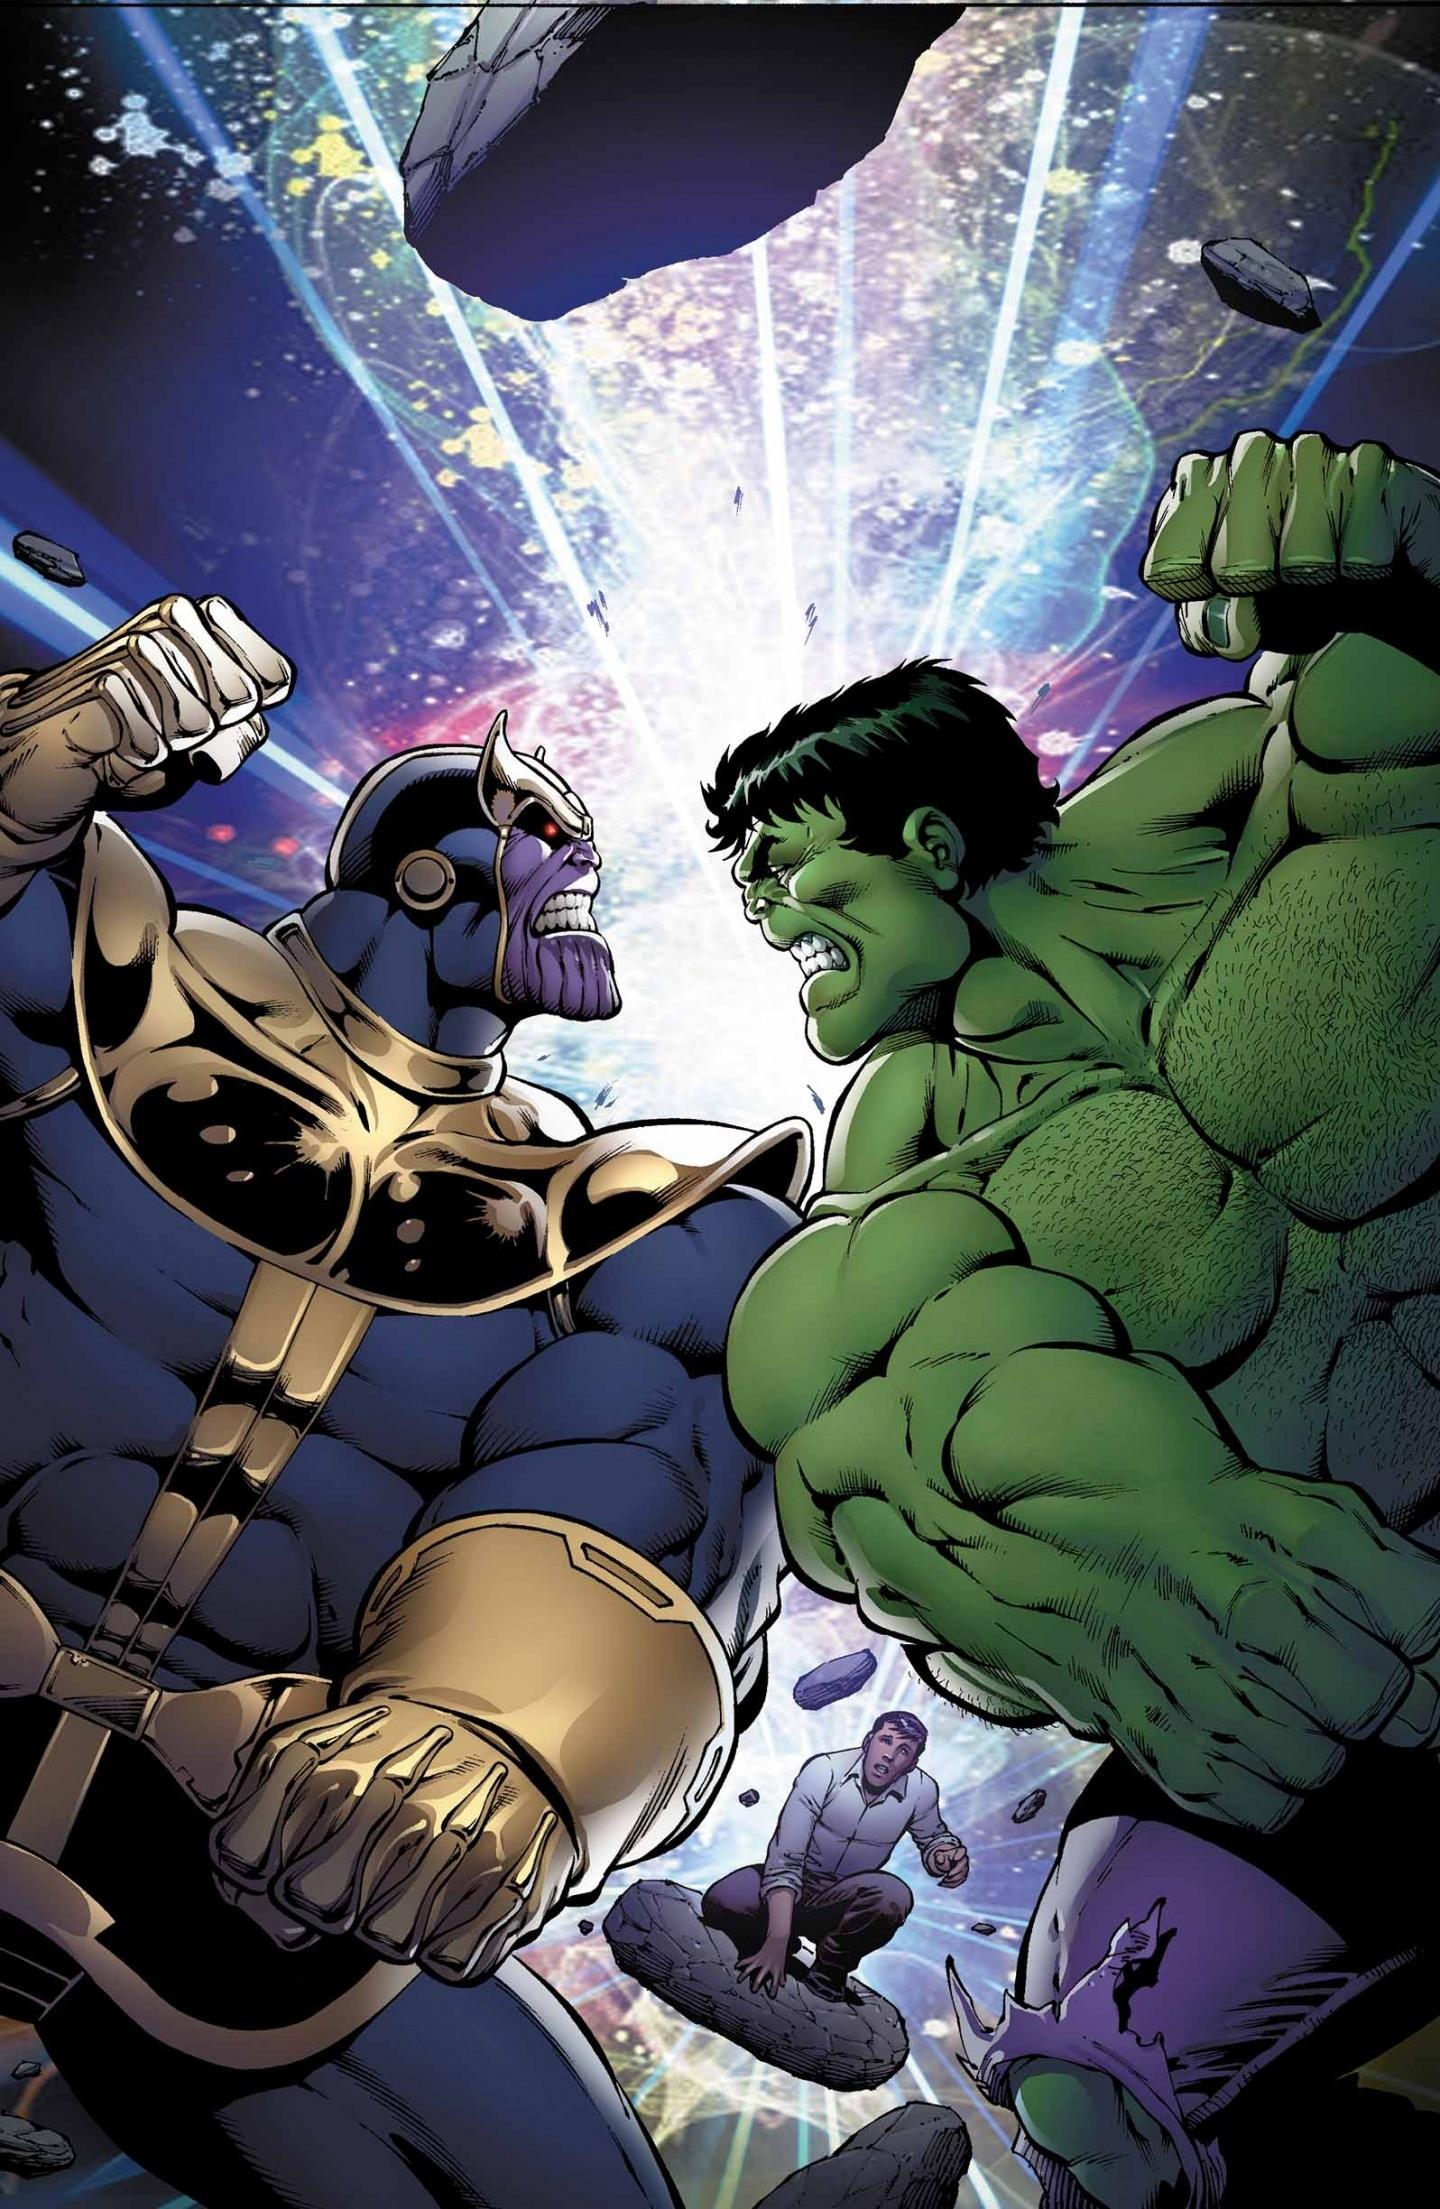 Thanos Vs Hulk Cover Hulk Vs Photo Background Wallpapers Images 1440x2209